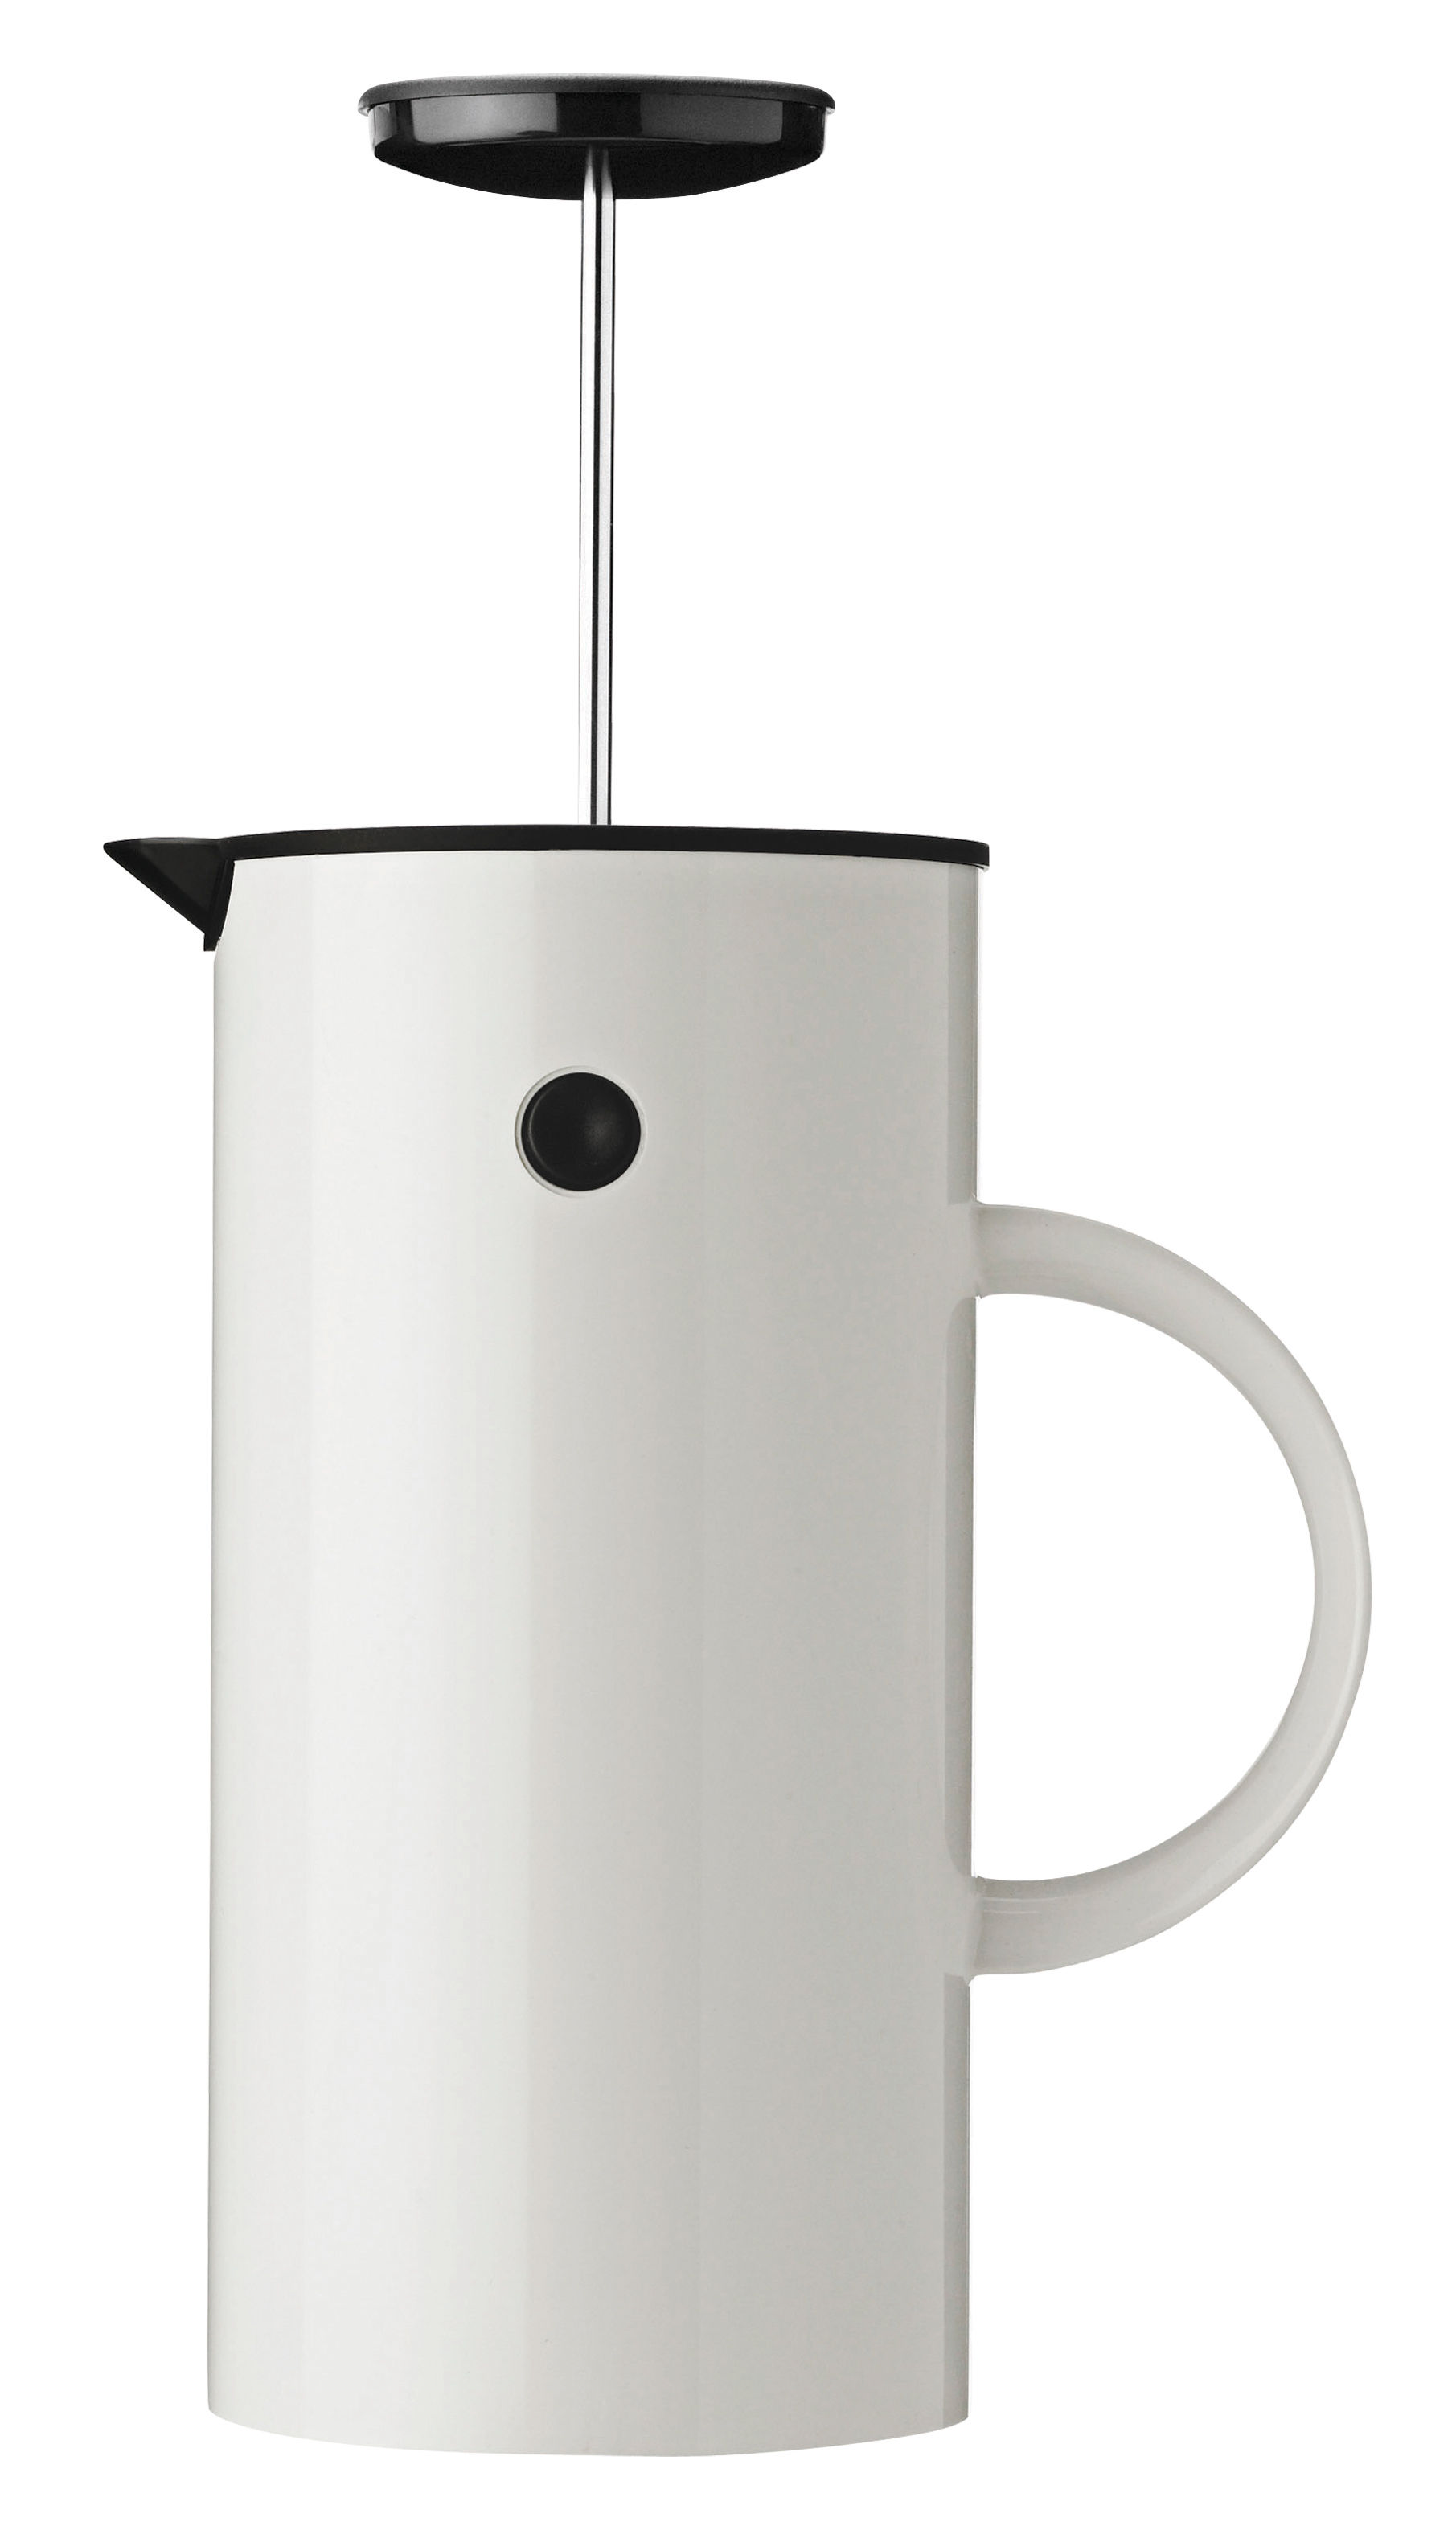 Küche - Kaffekannen - Classic Druckkolben-Kaffeemaschine / fasst 8 Tassen - Stelton - Weiß - ABS, Polypropylen, rostfreier Stahl